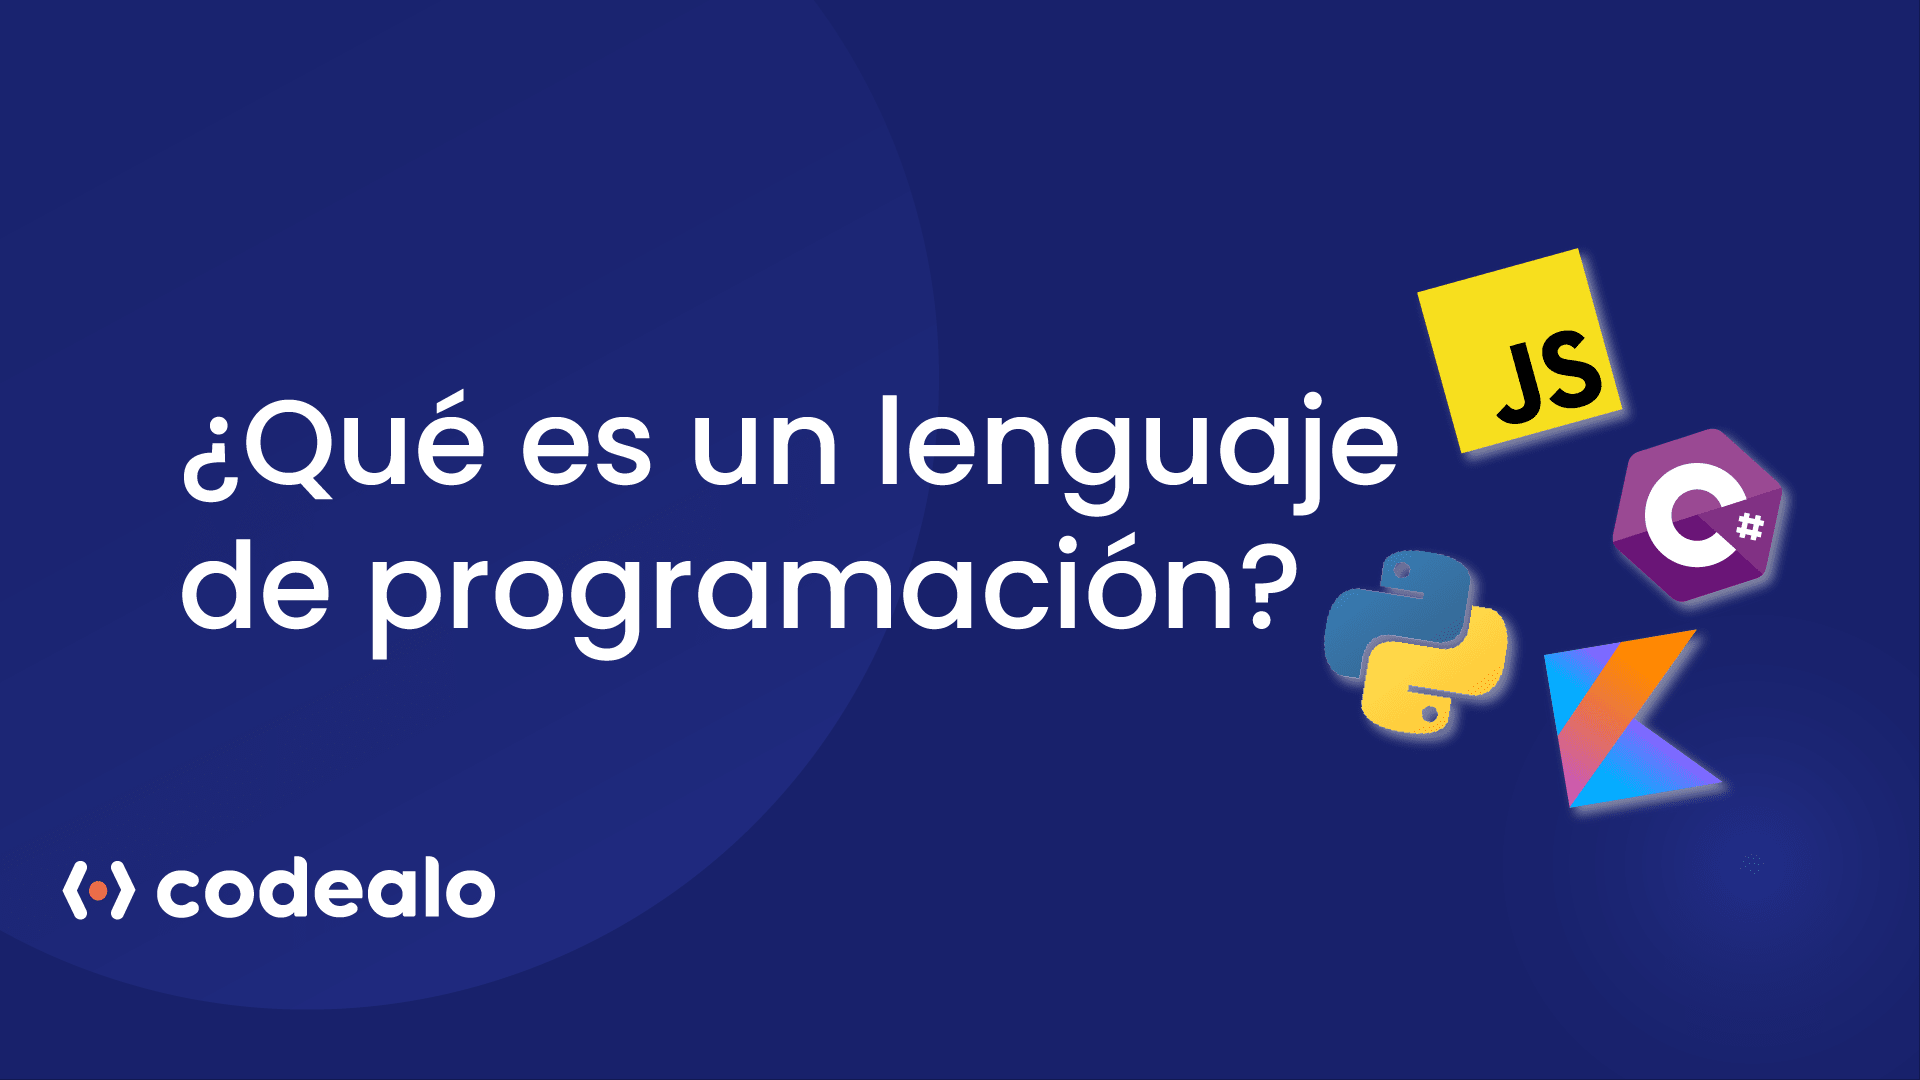 banner-que-es-un-lenguaje-de-programacion